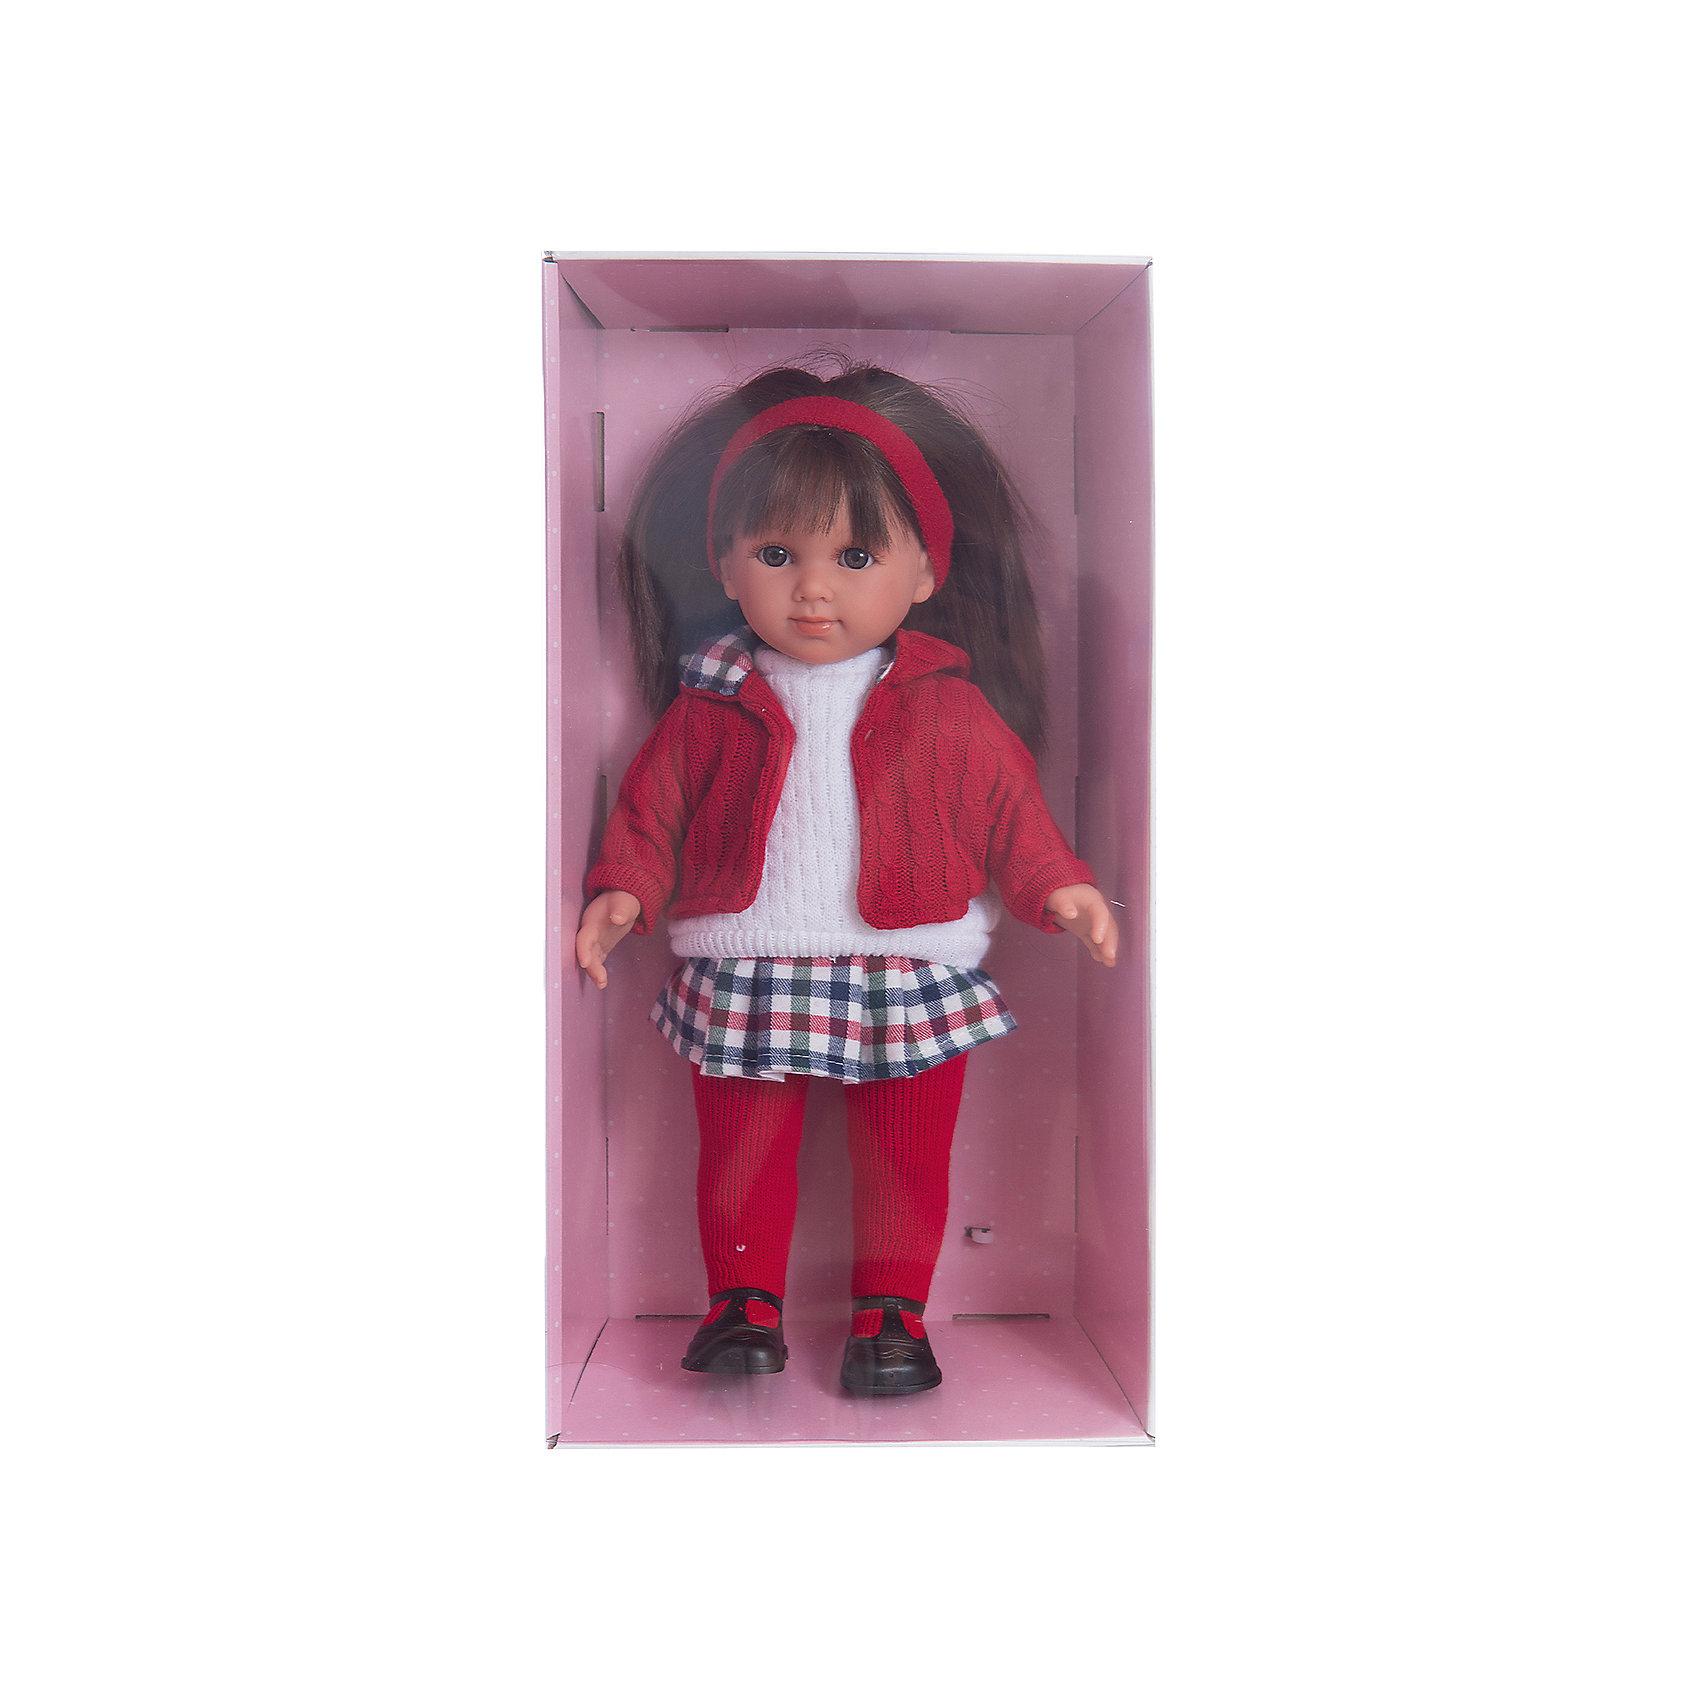 Llorens Кукла Елена, 35 см, Llorens куклы и одежда для кукол llorens кукла изабела 33 см со звуком